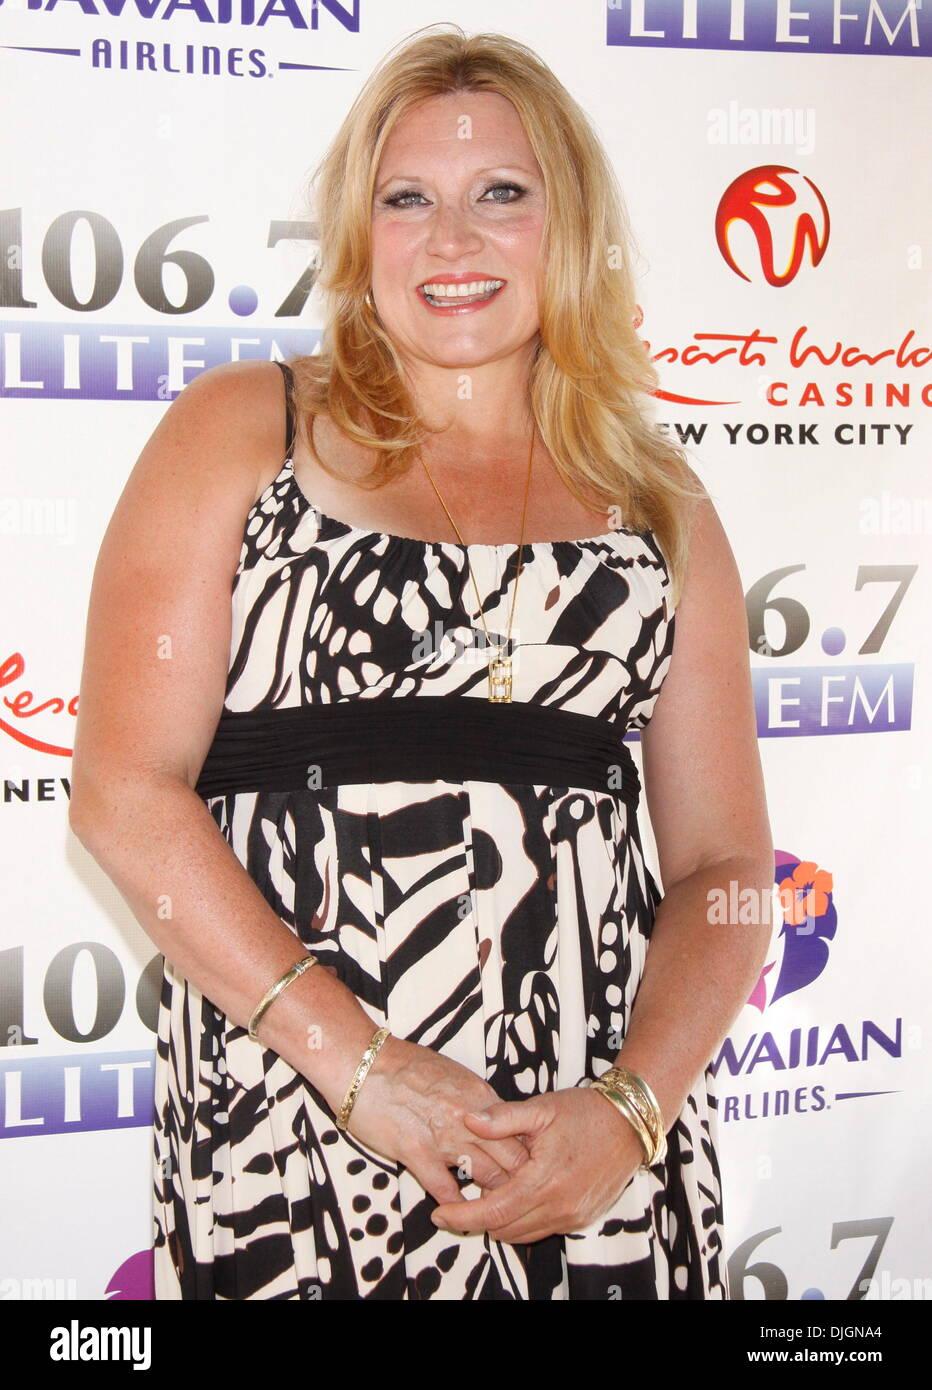 Remarkable Radio Personality Delilah Rene Luke 106 7 Lite Fm39S Broadway In Easy Diy Christmas Decorations Tissureus